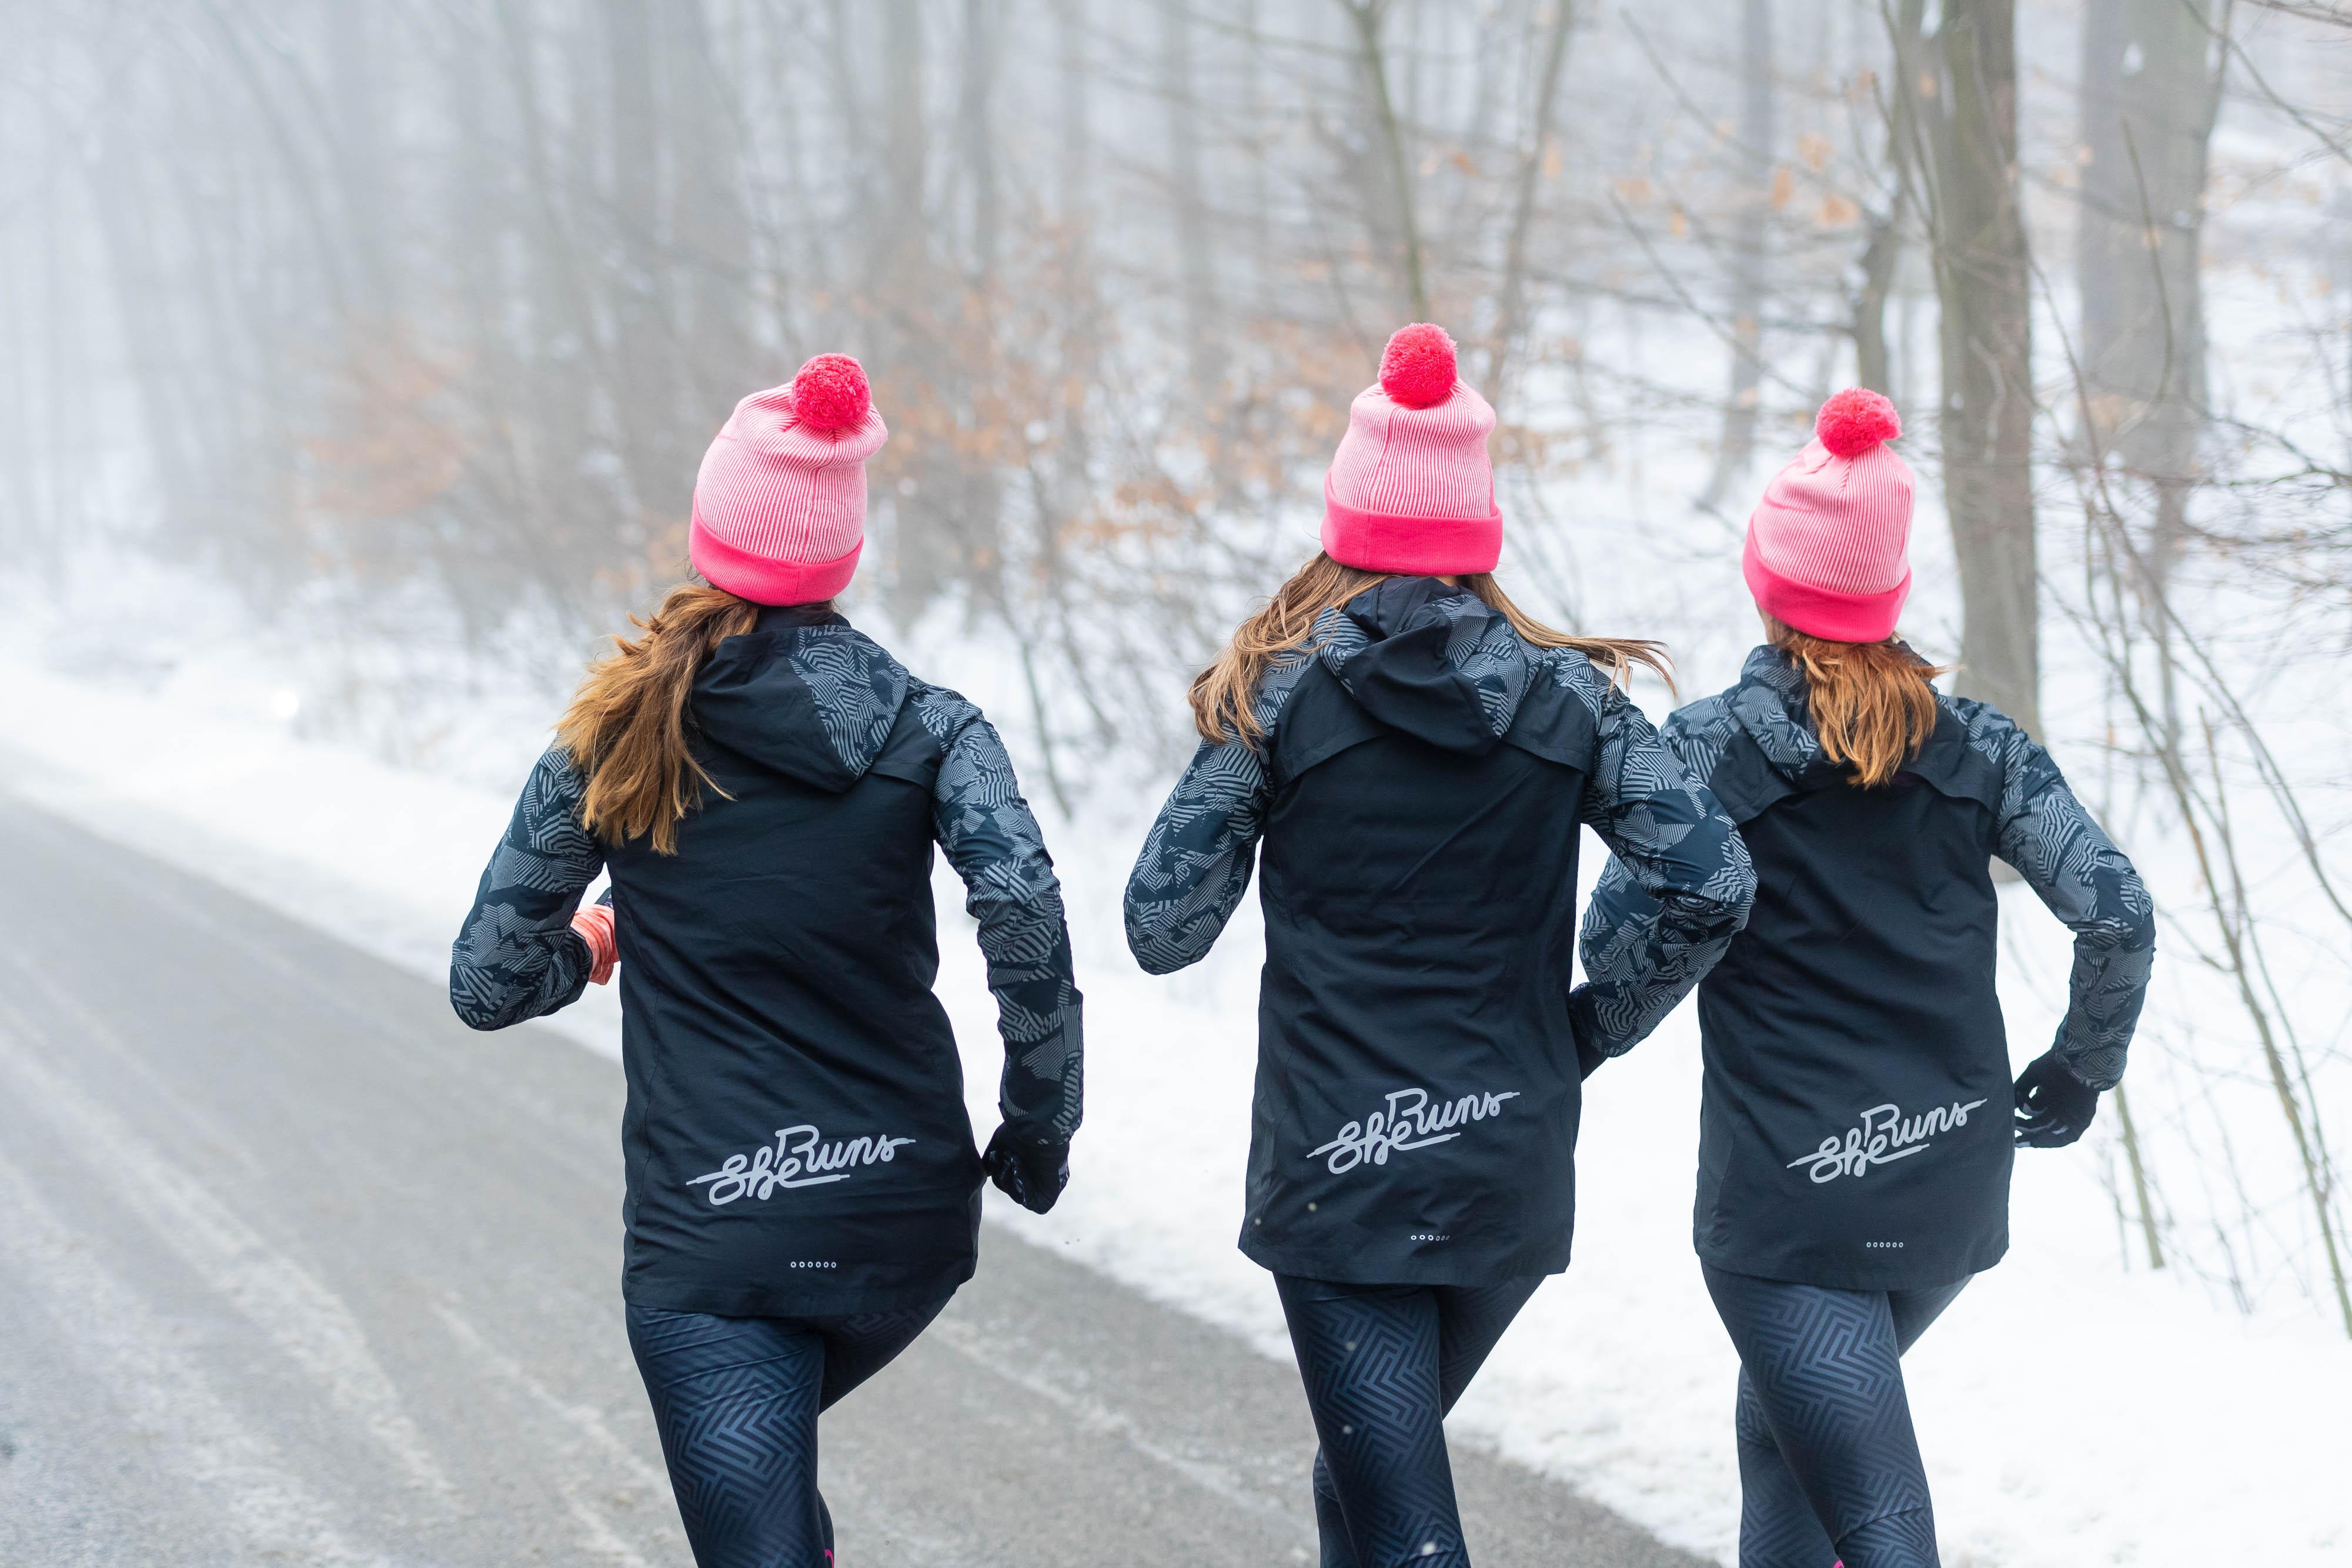 tréningy pre ženy v zime